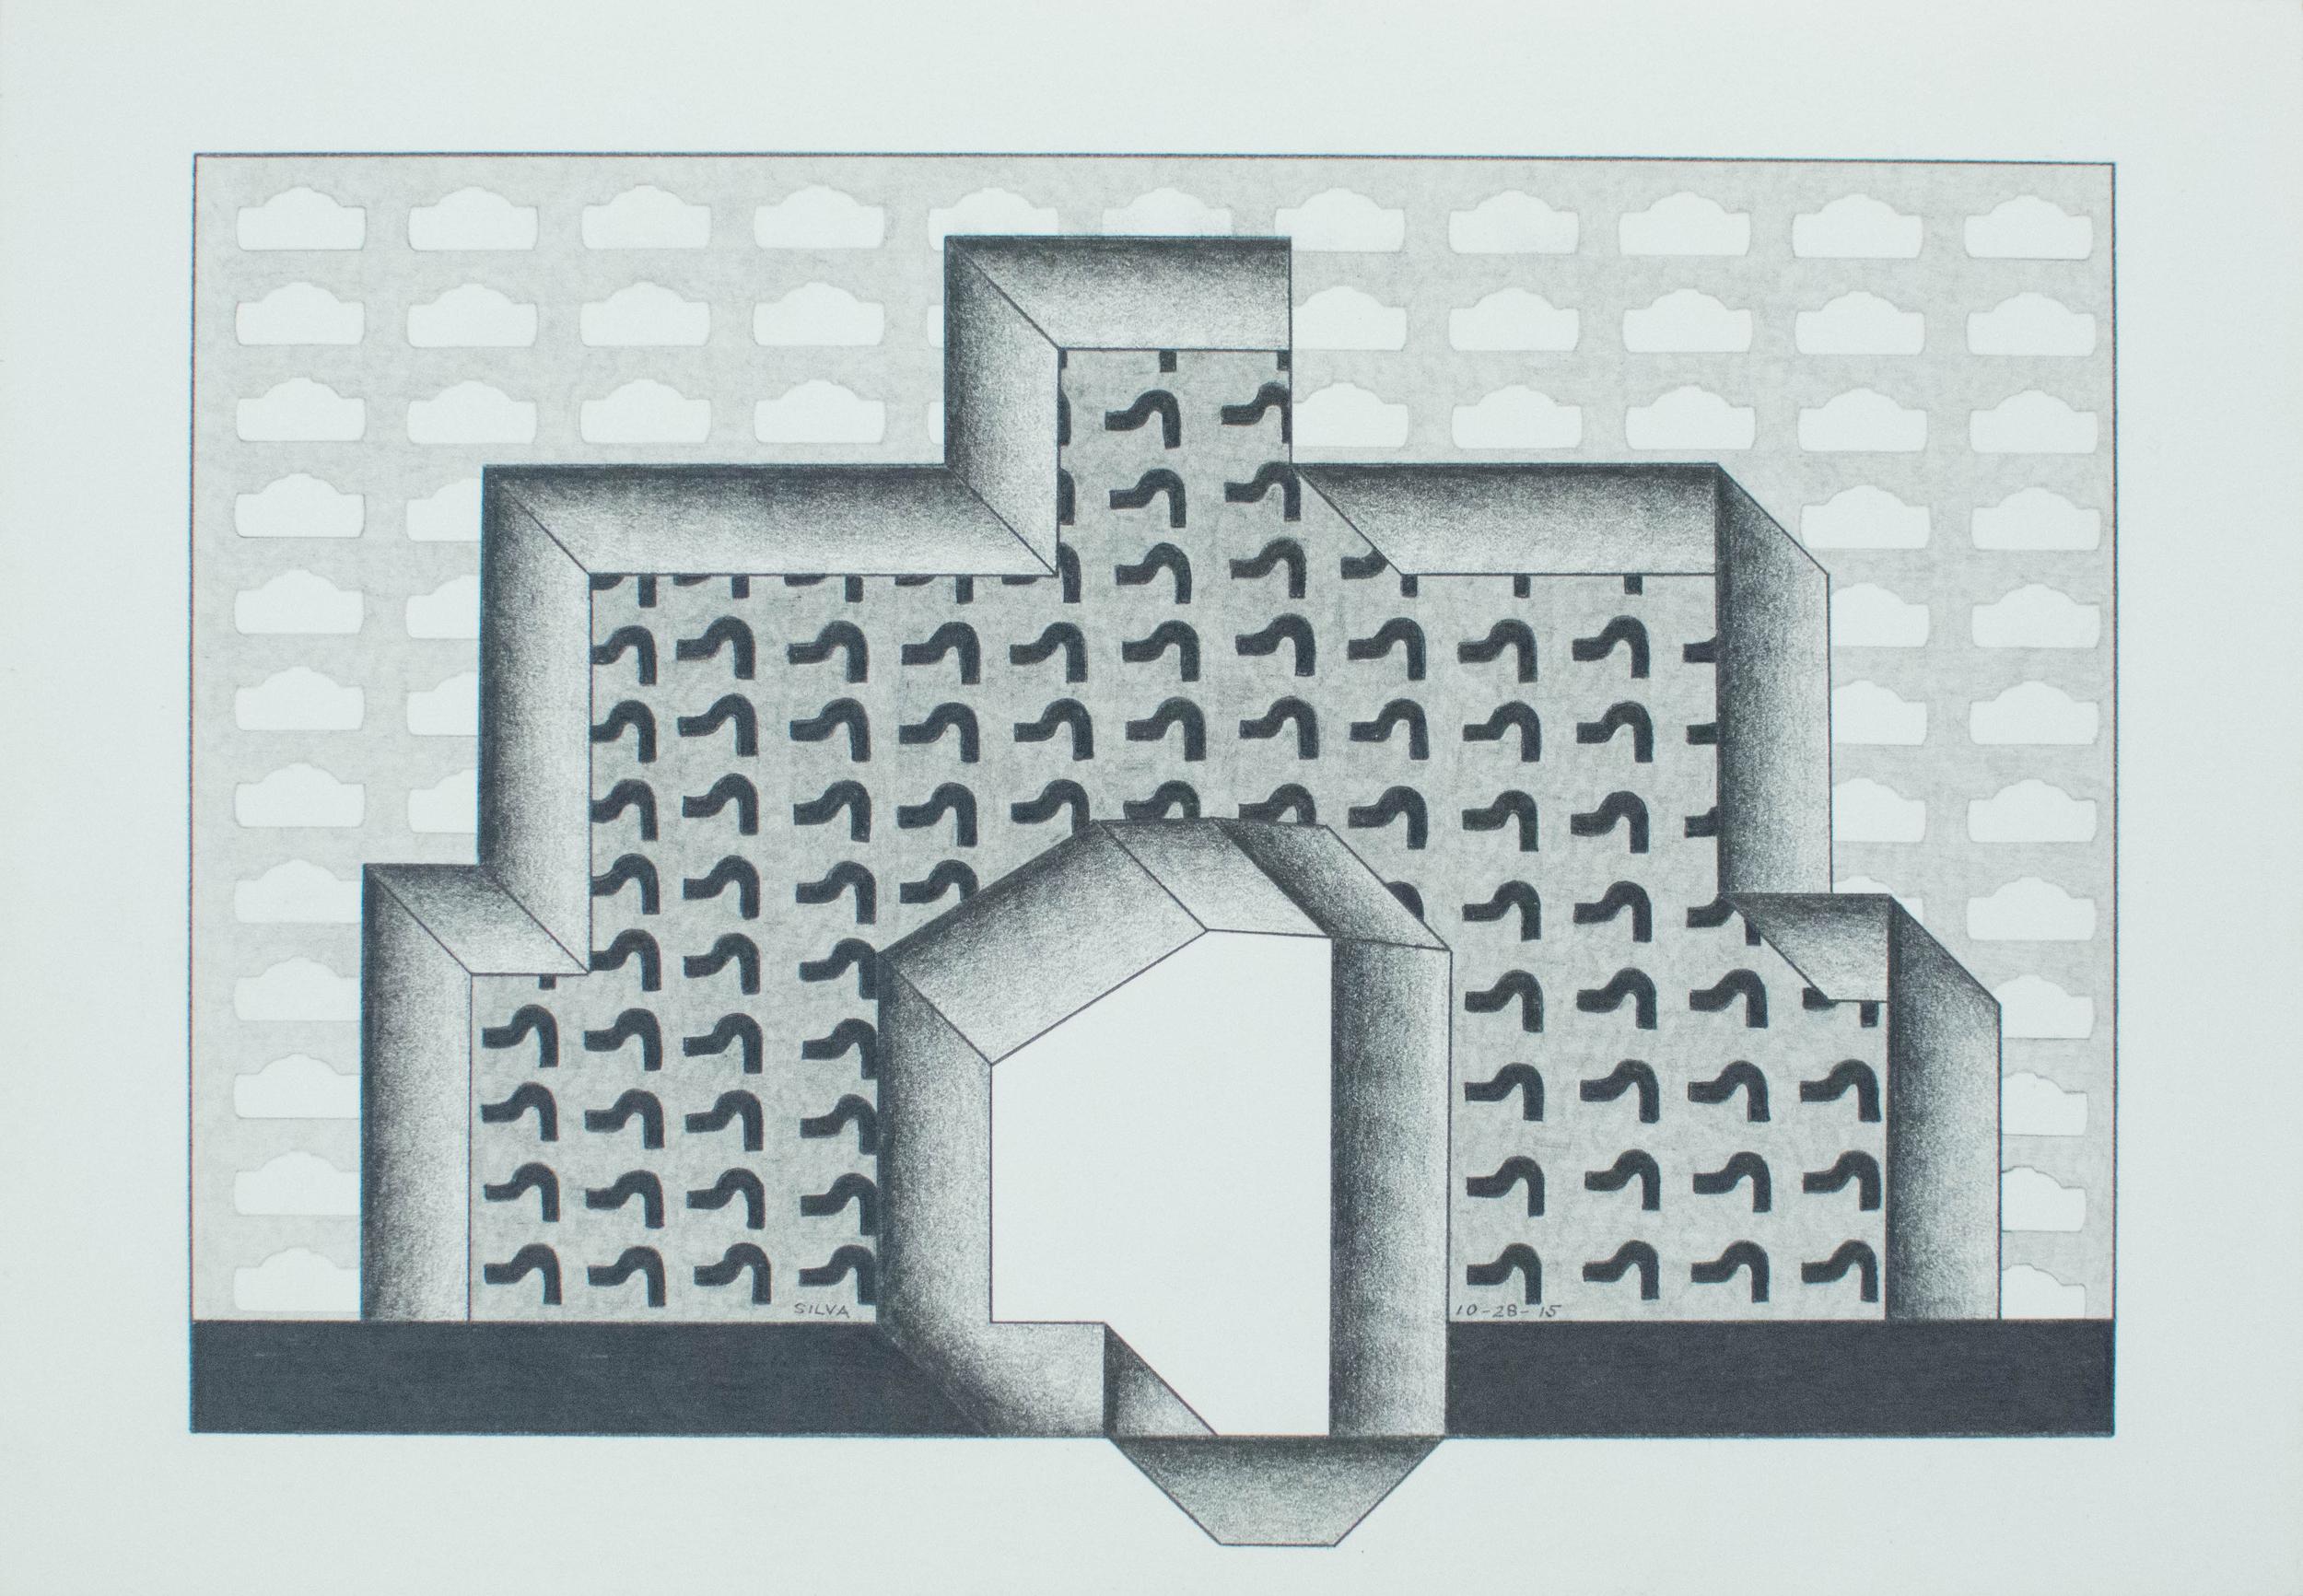 10-28-15, 2015, Graphite on paper, 7 x 10 inches